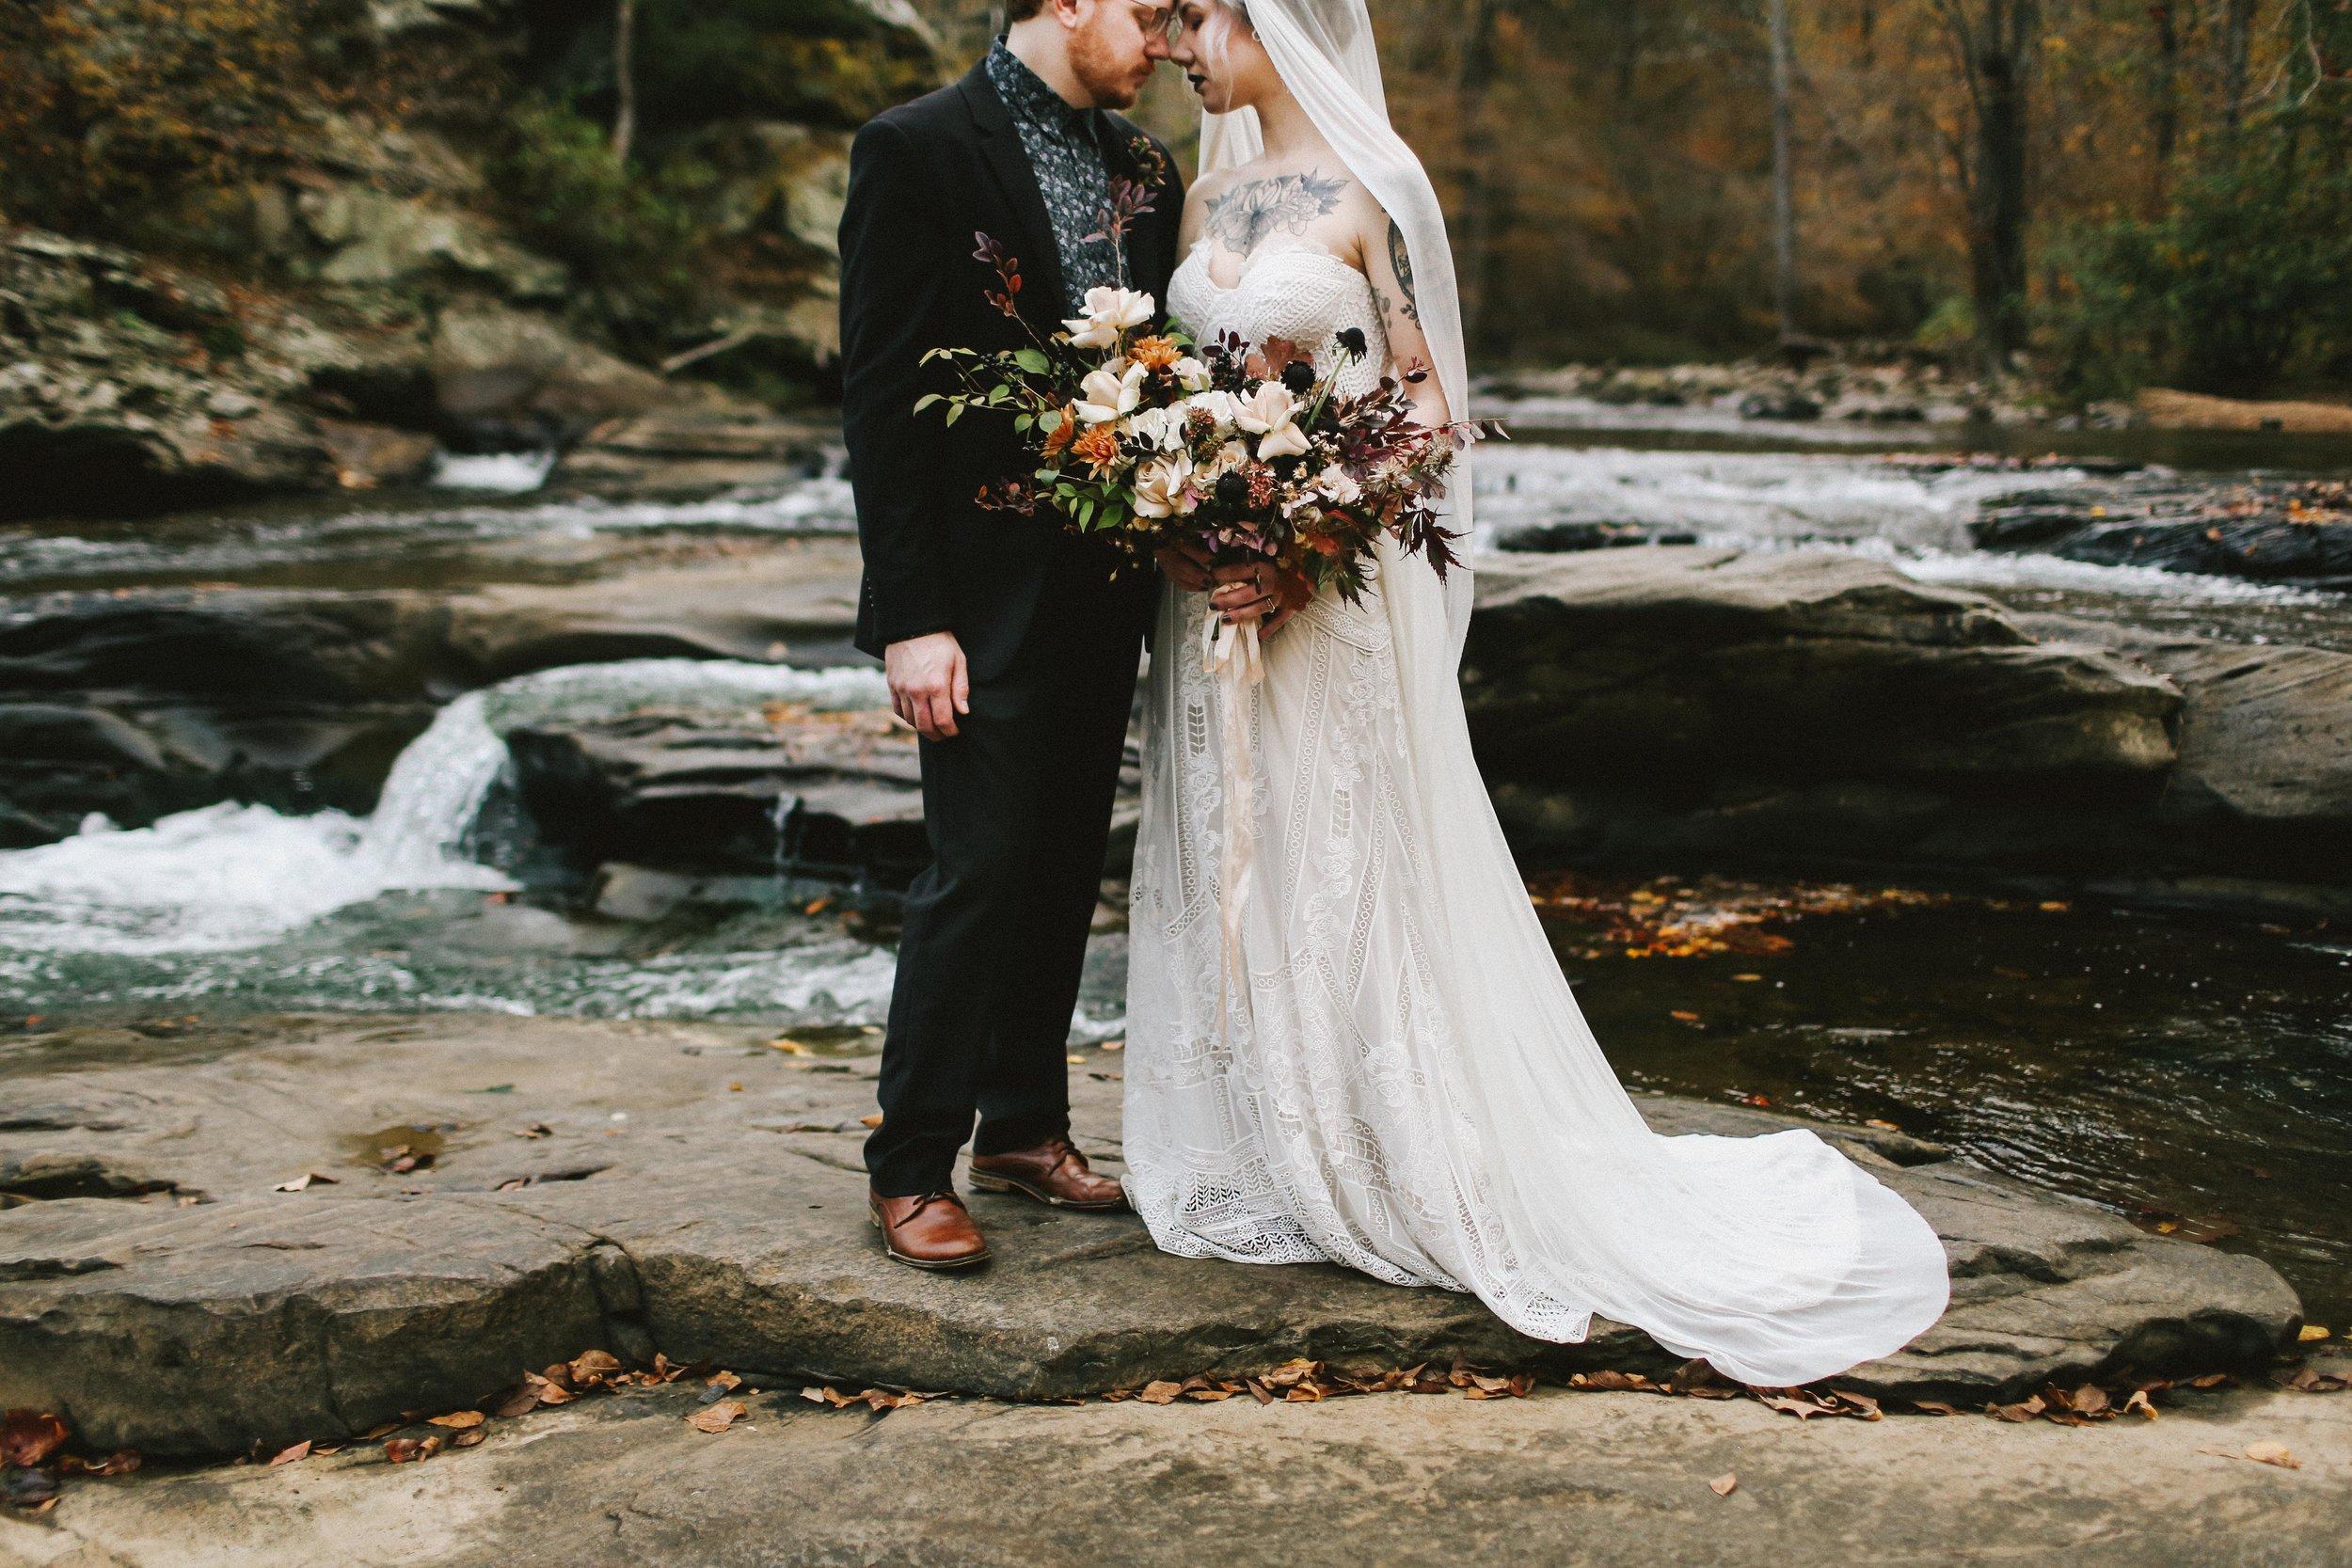 creekside-autumn-wedding088.jpg